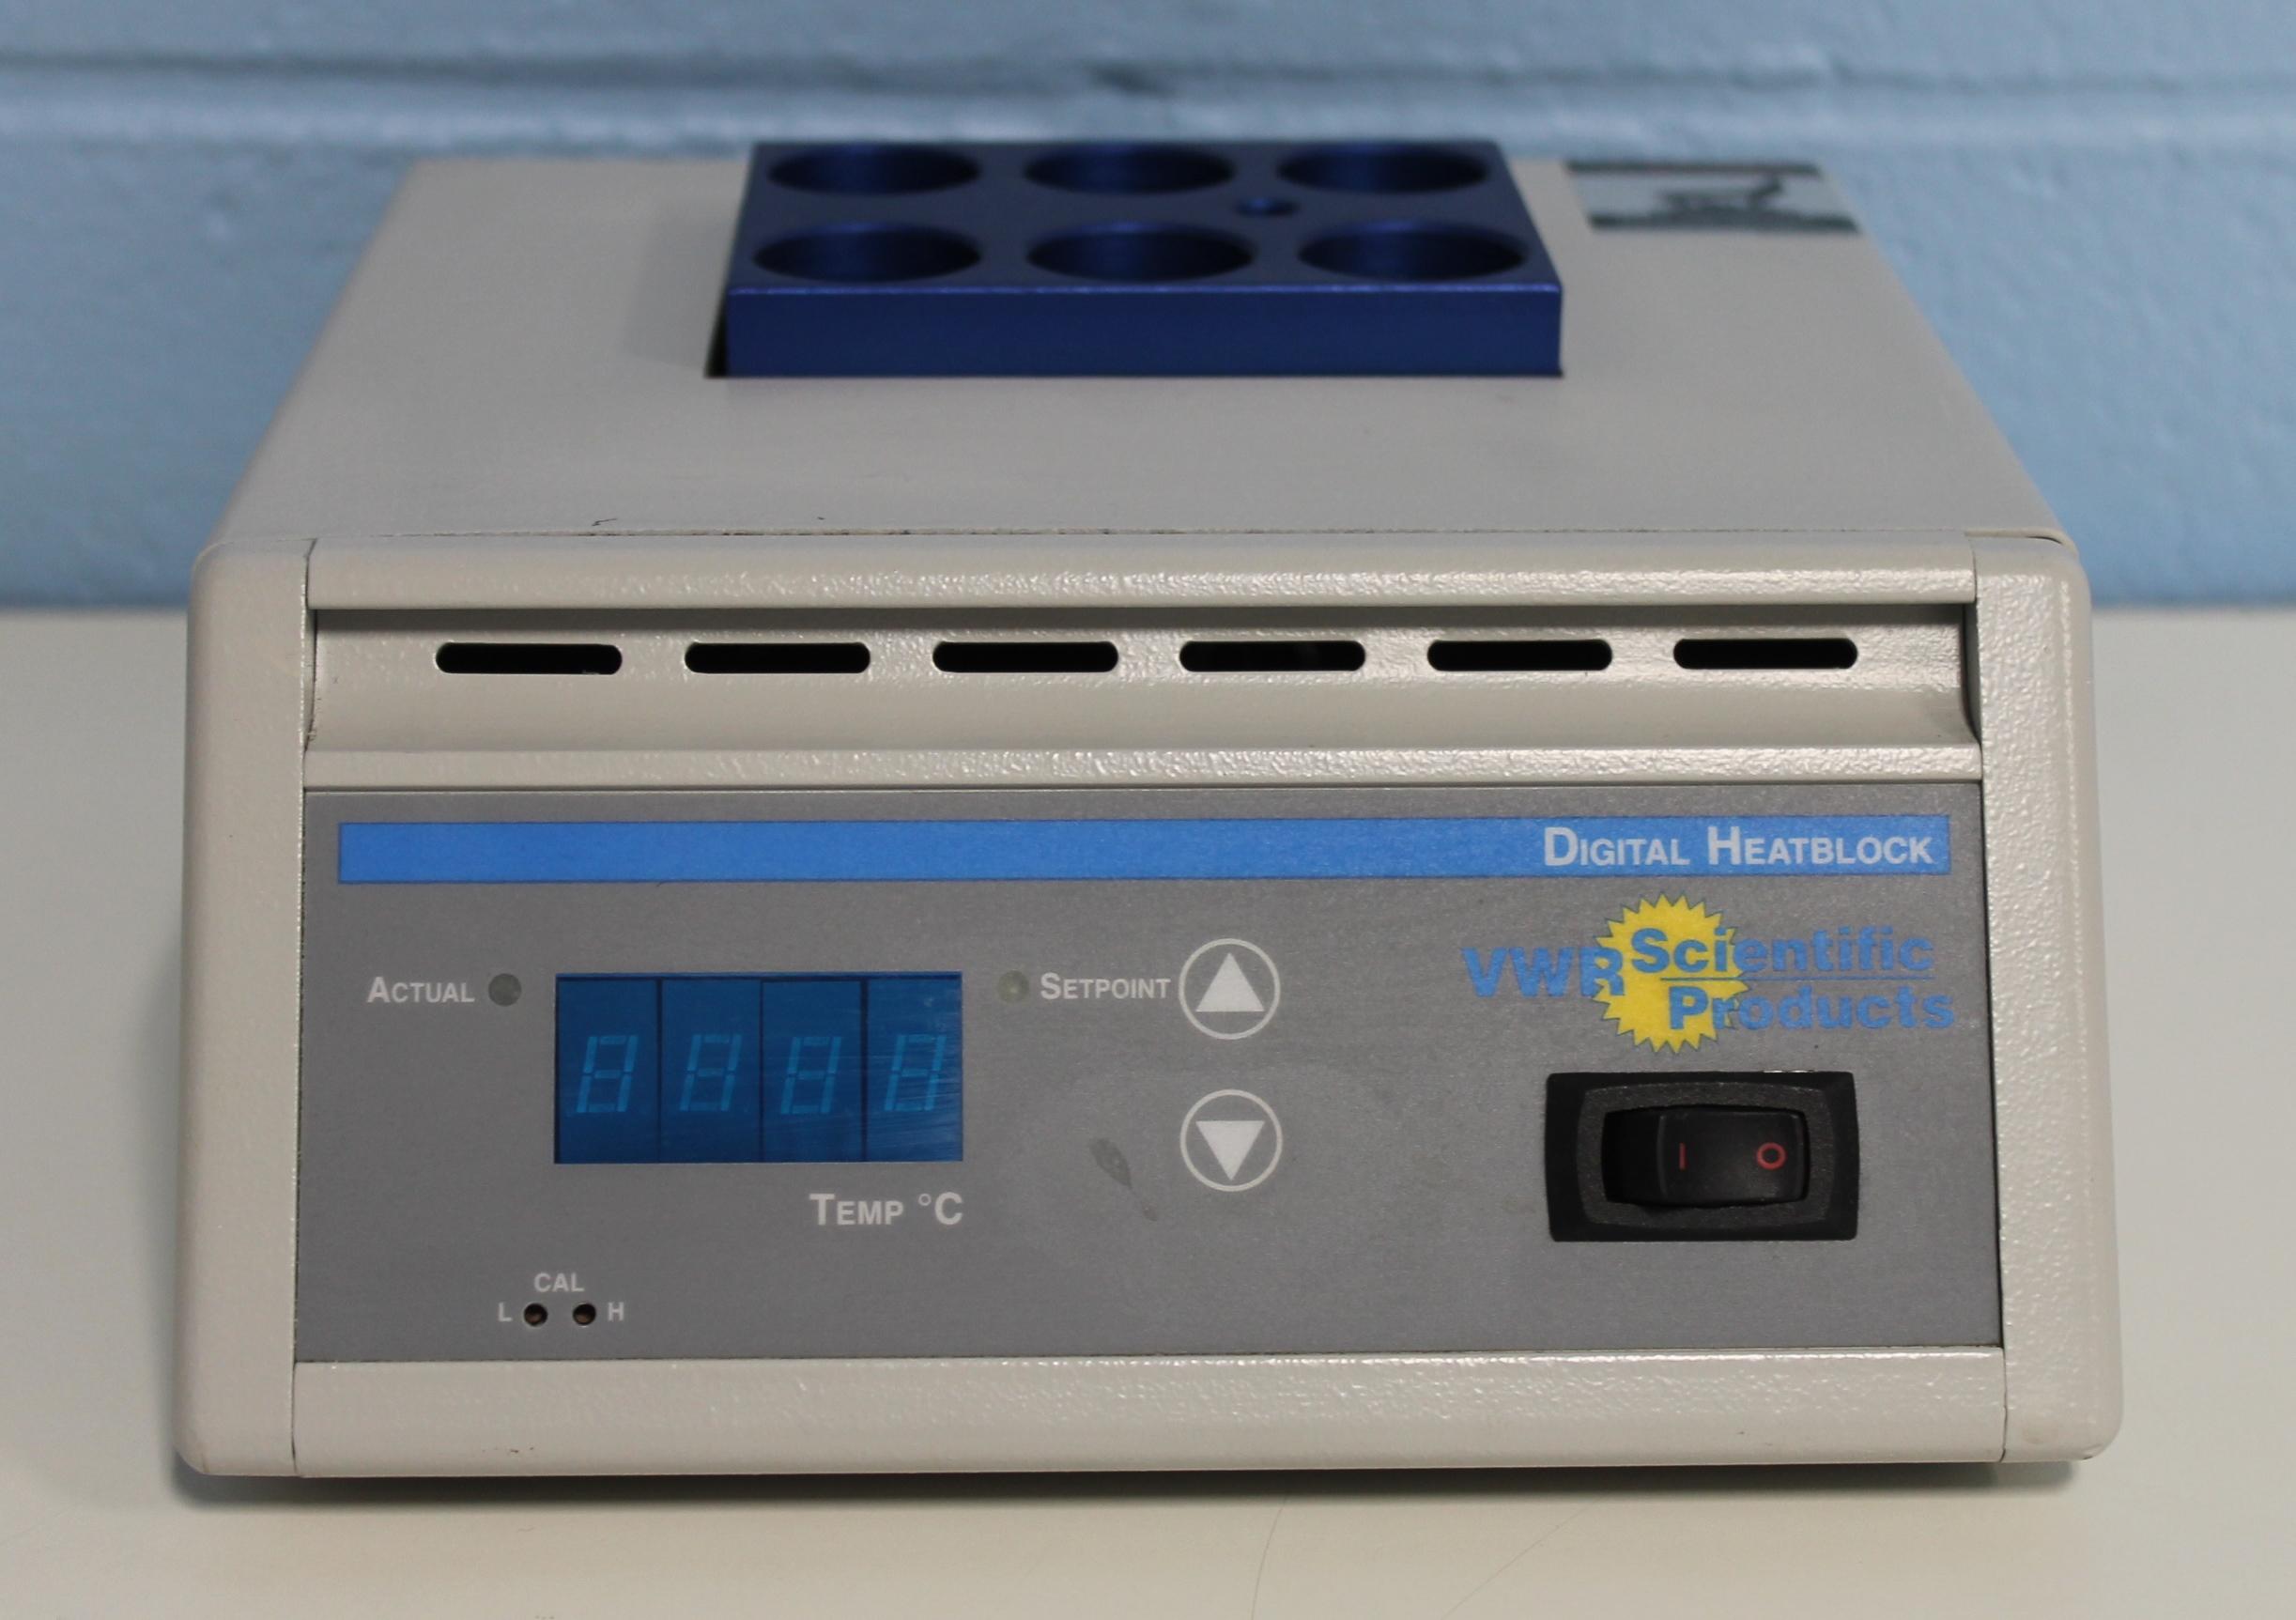 VWR Digital Heatblock CAT No. 13259-050 P/N 949035 Image